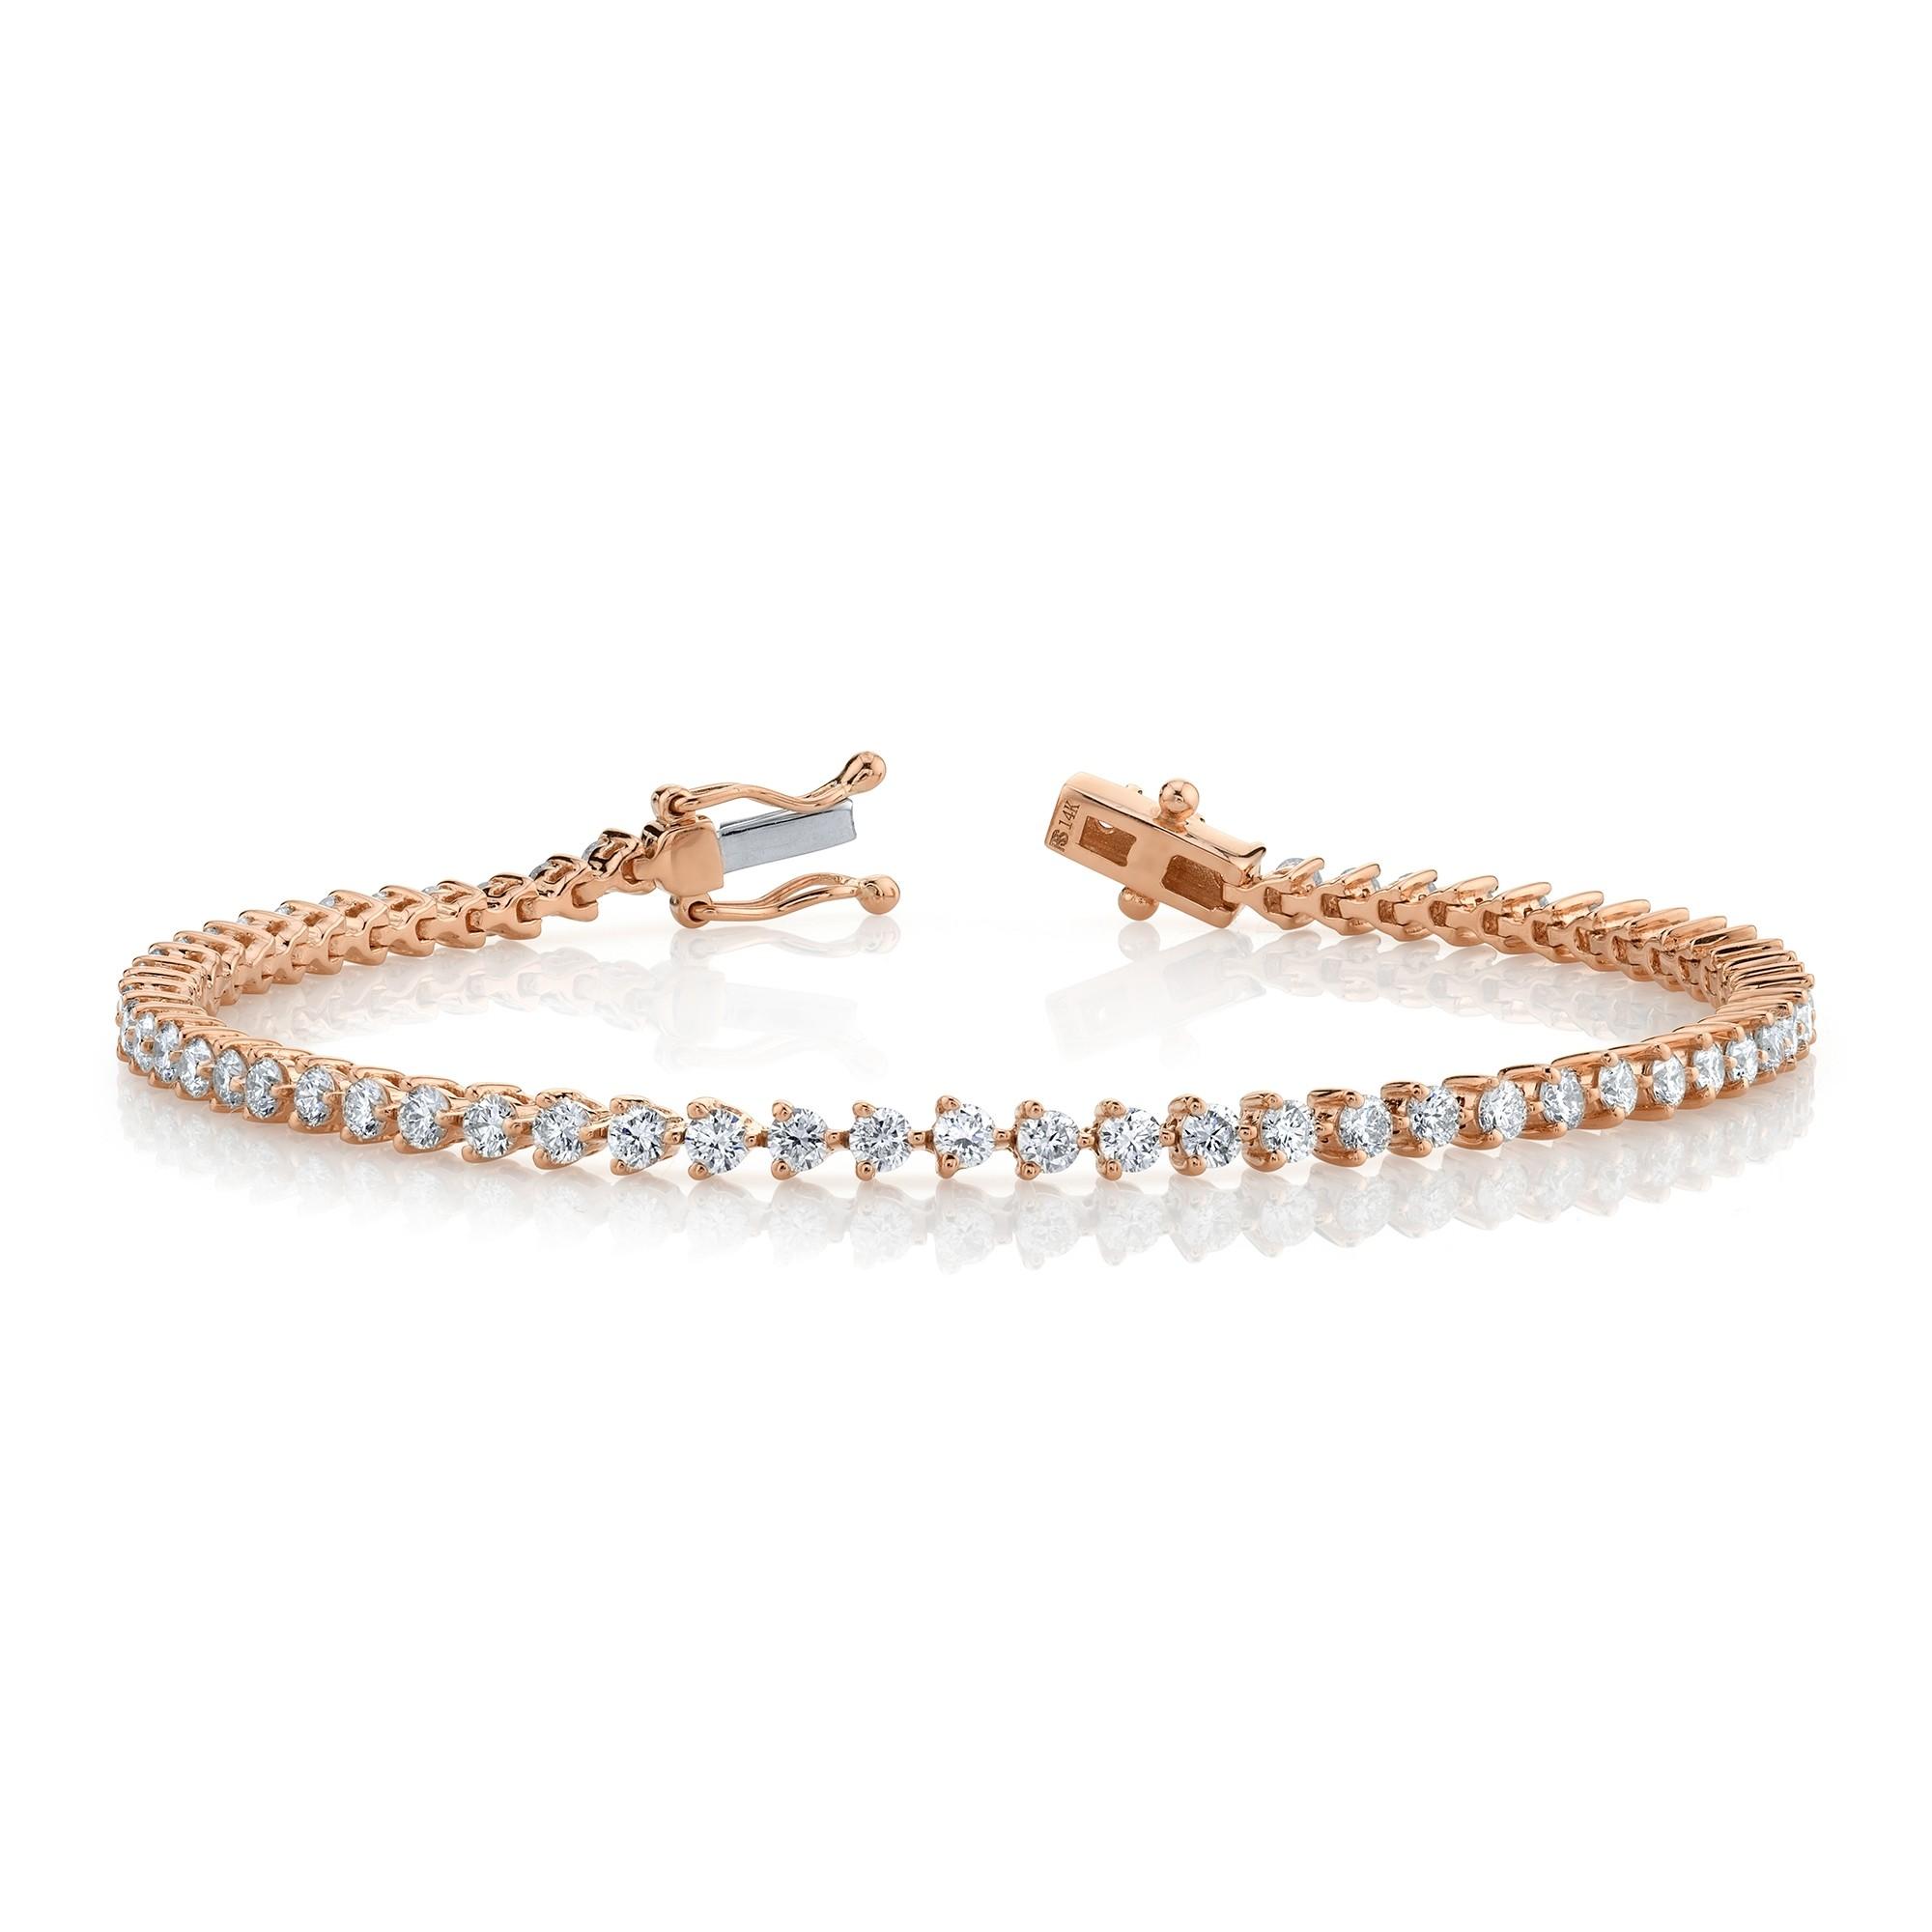 14k Rose Gold 3 Prong 2.5CT Diamond Tennis Bracelet